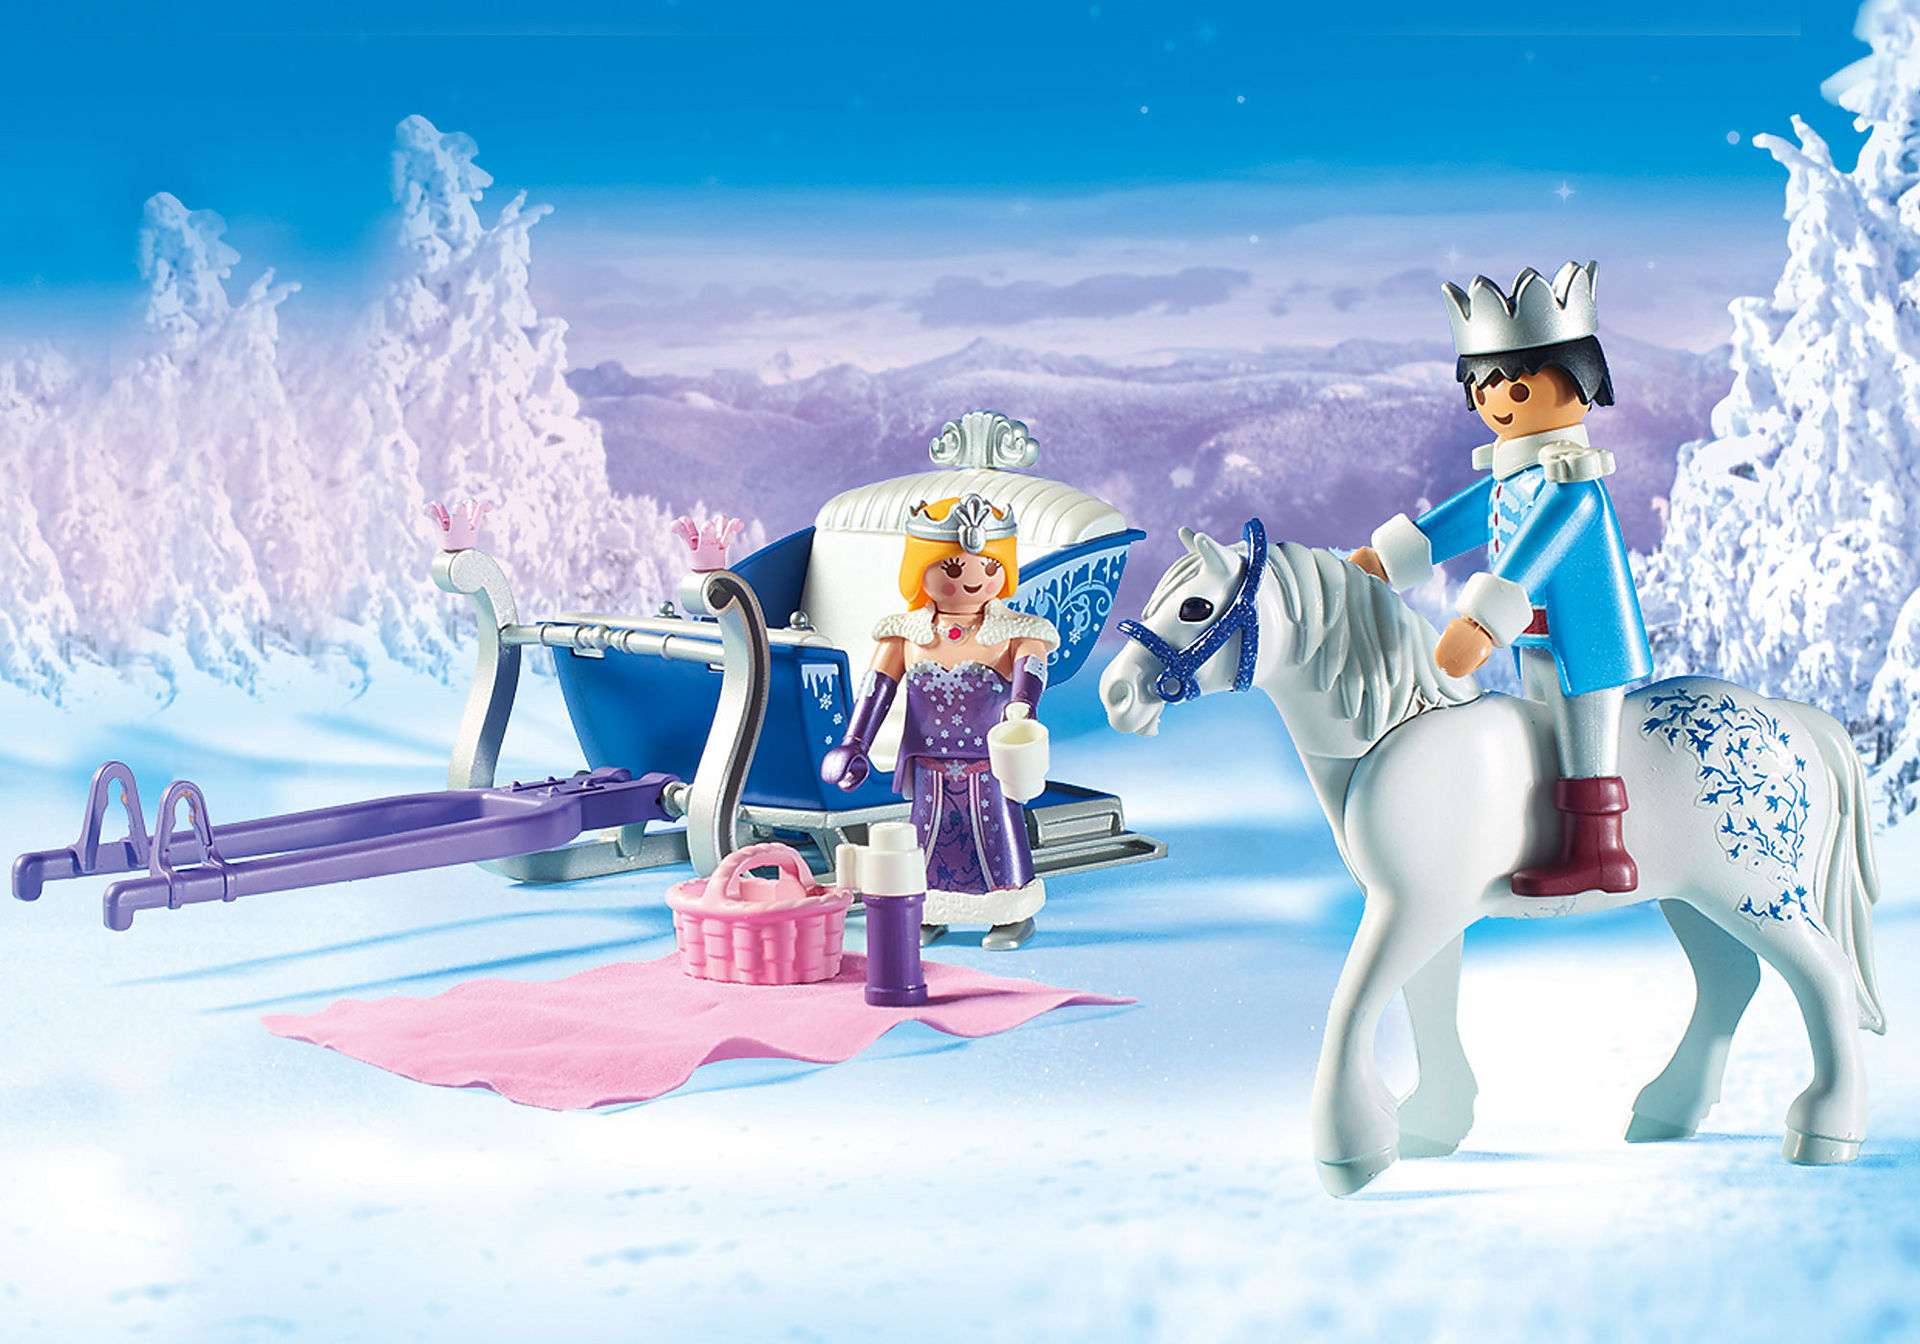 9474 Sleigh with Royal Couple zoom image4